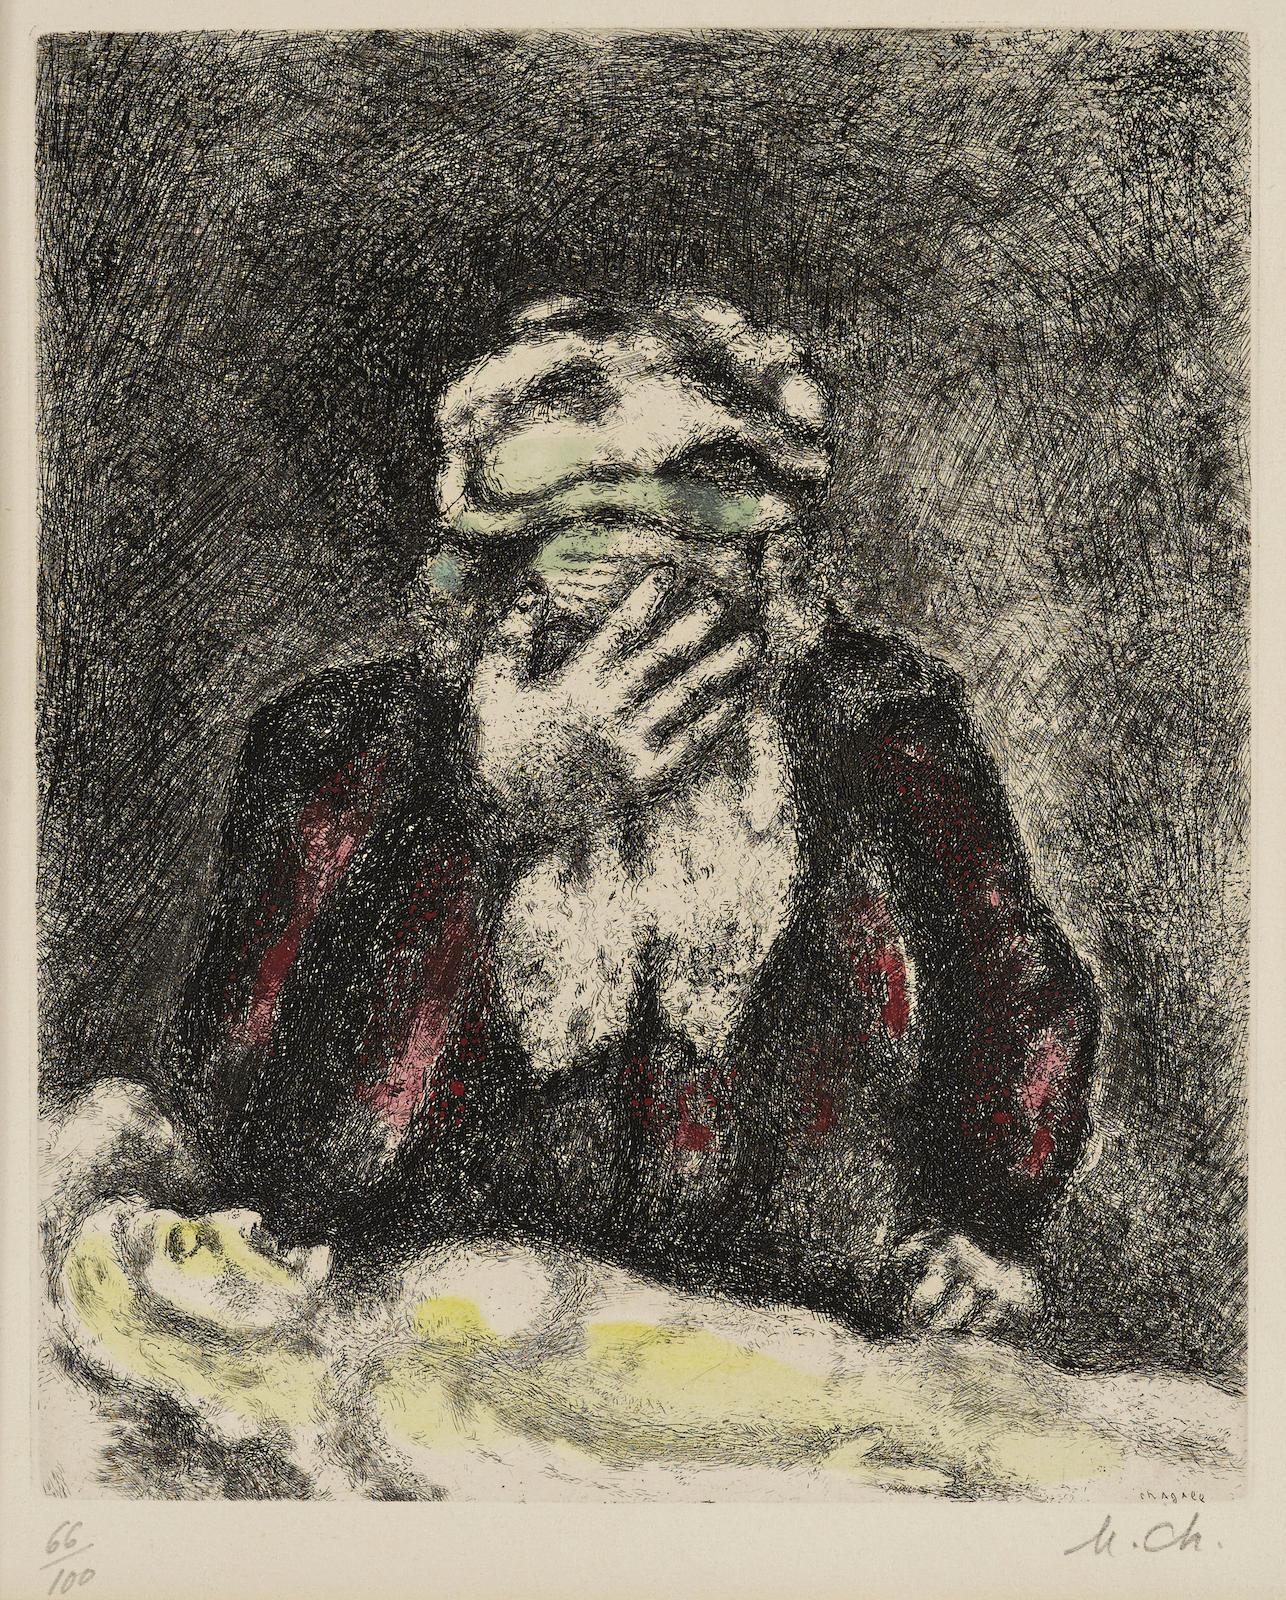 Marc Chagall-Abraham pleurant Sara, pl. 12, from La Bible (V. 210; C. bk. 30)-1939